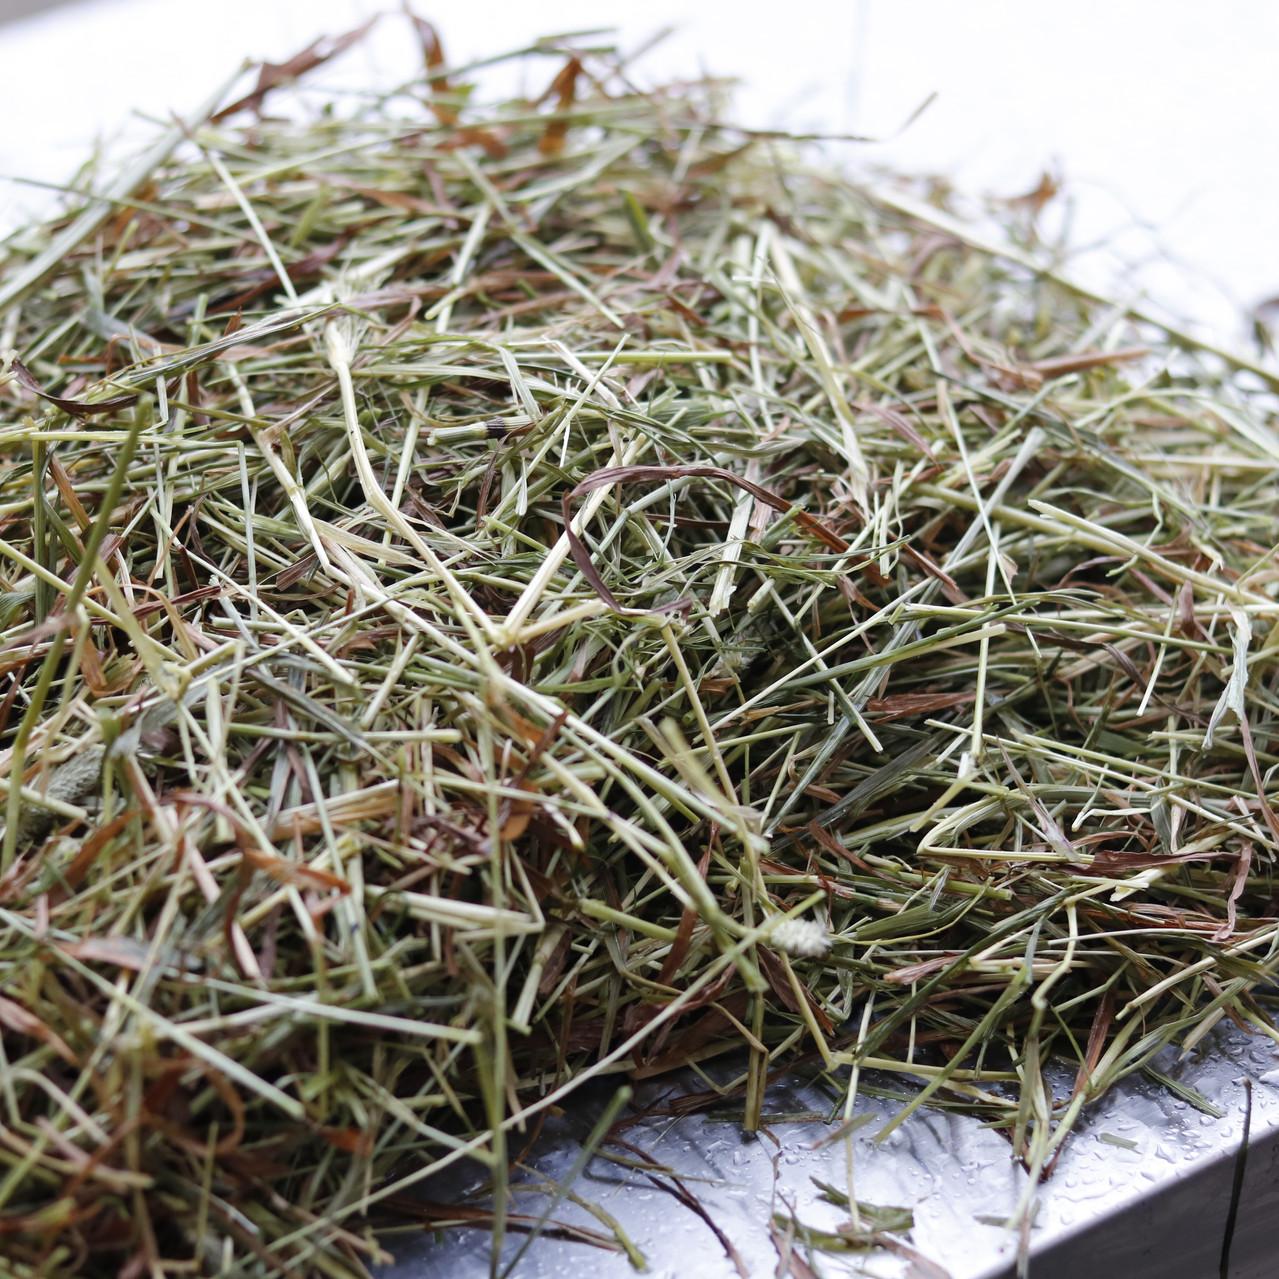 damp hay